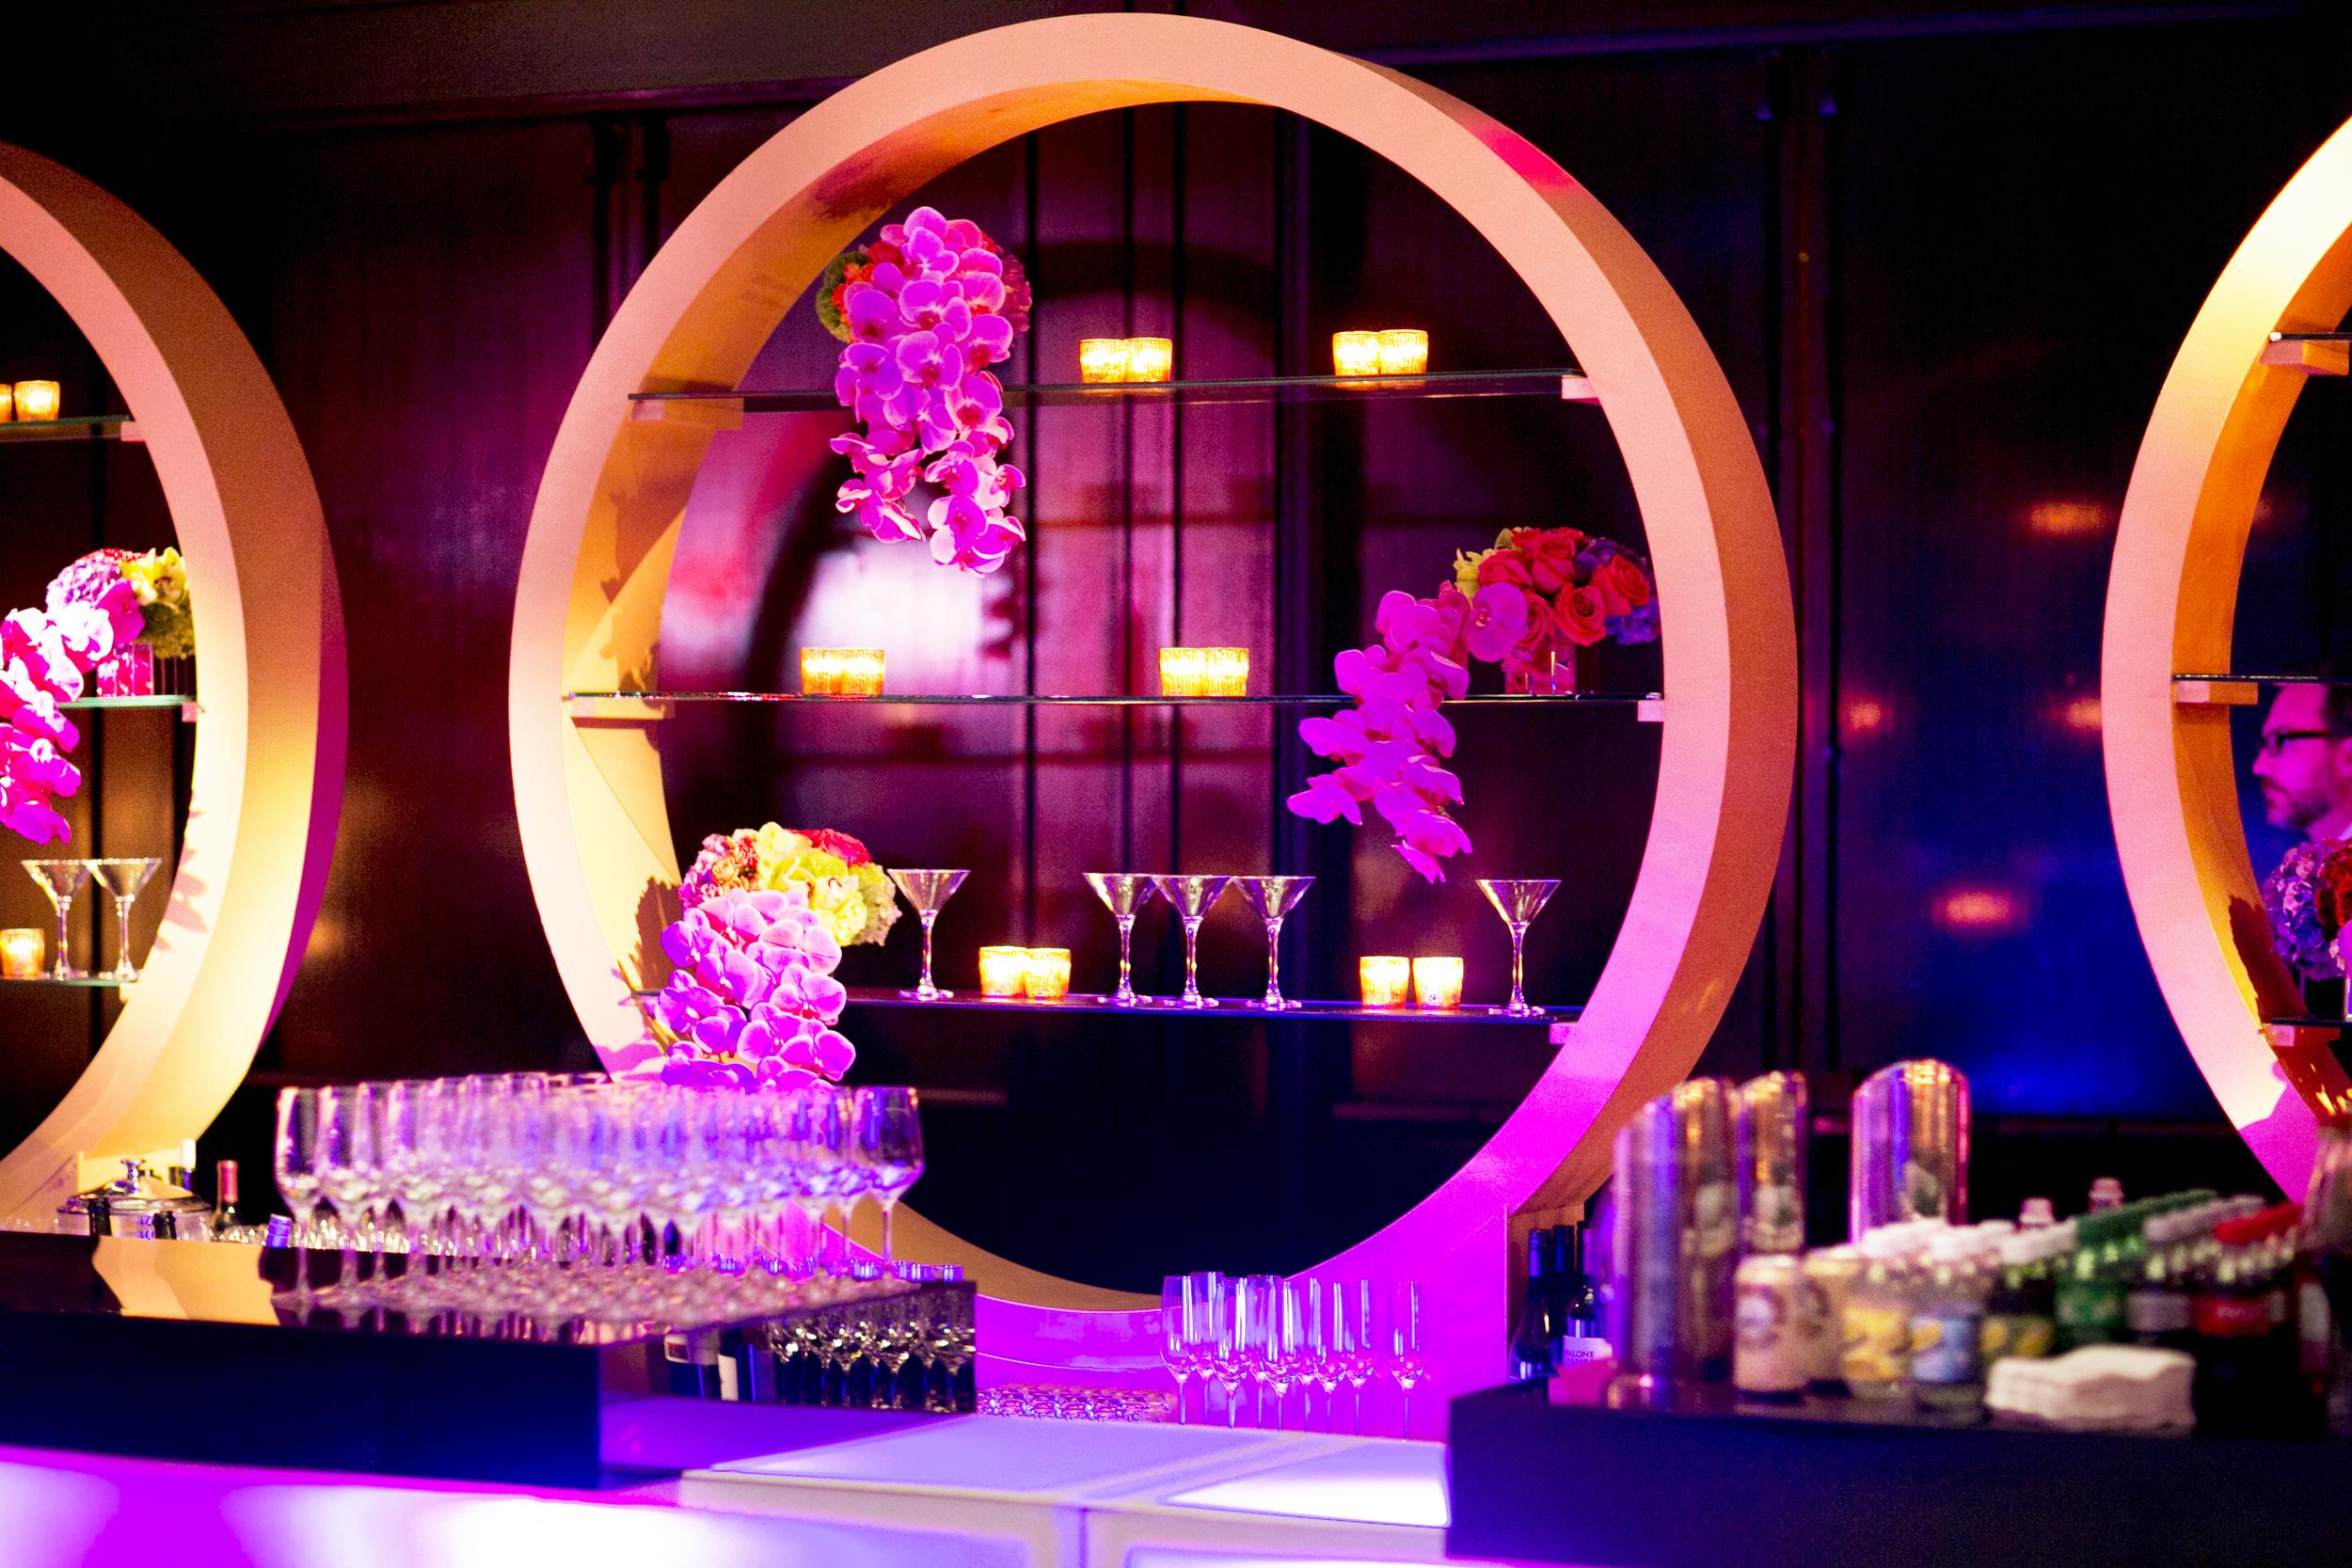 NYC-Wedding-Planner-Andrea-Freeman-Events-Mandarin-Oriental-15.jpg